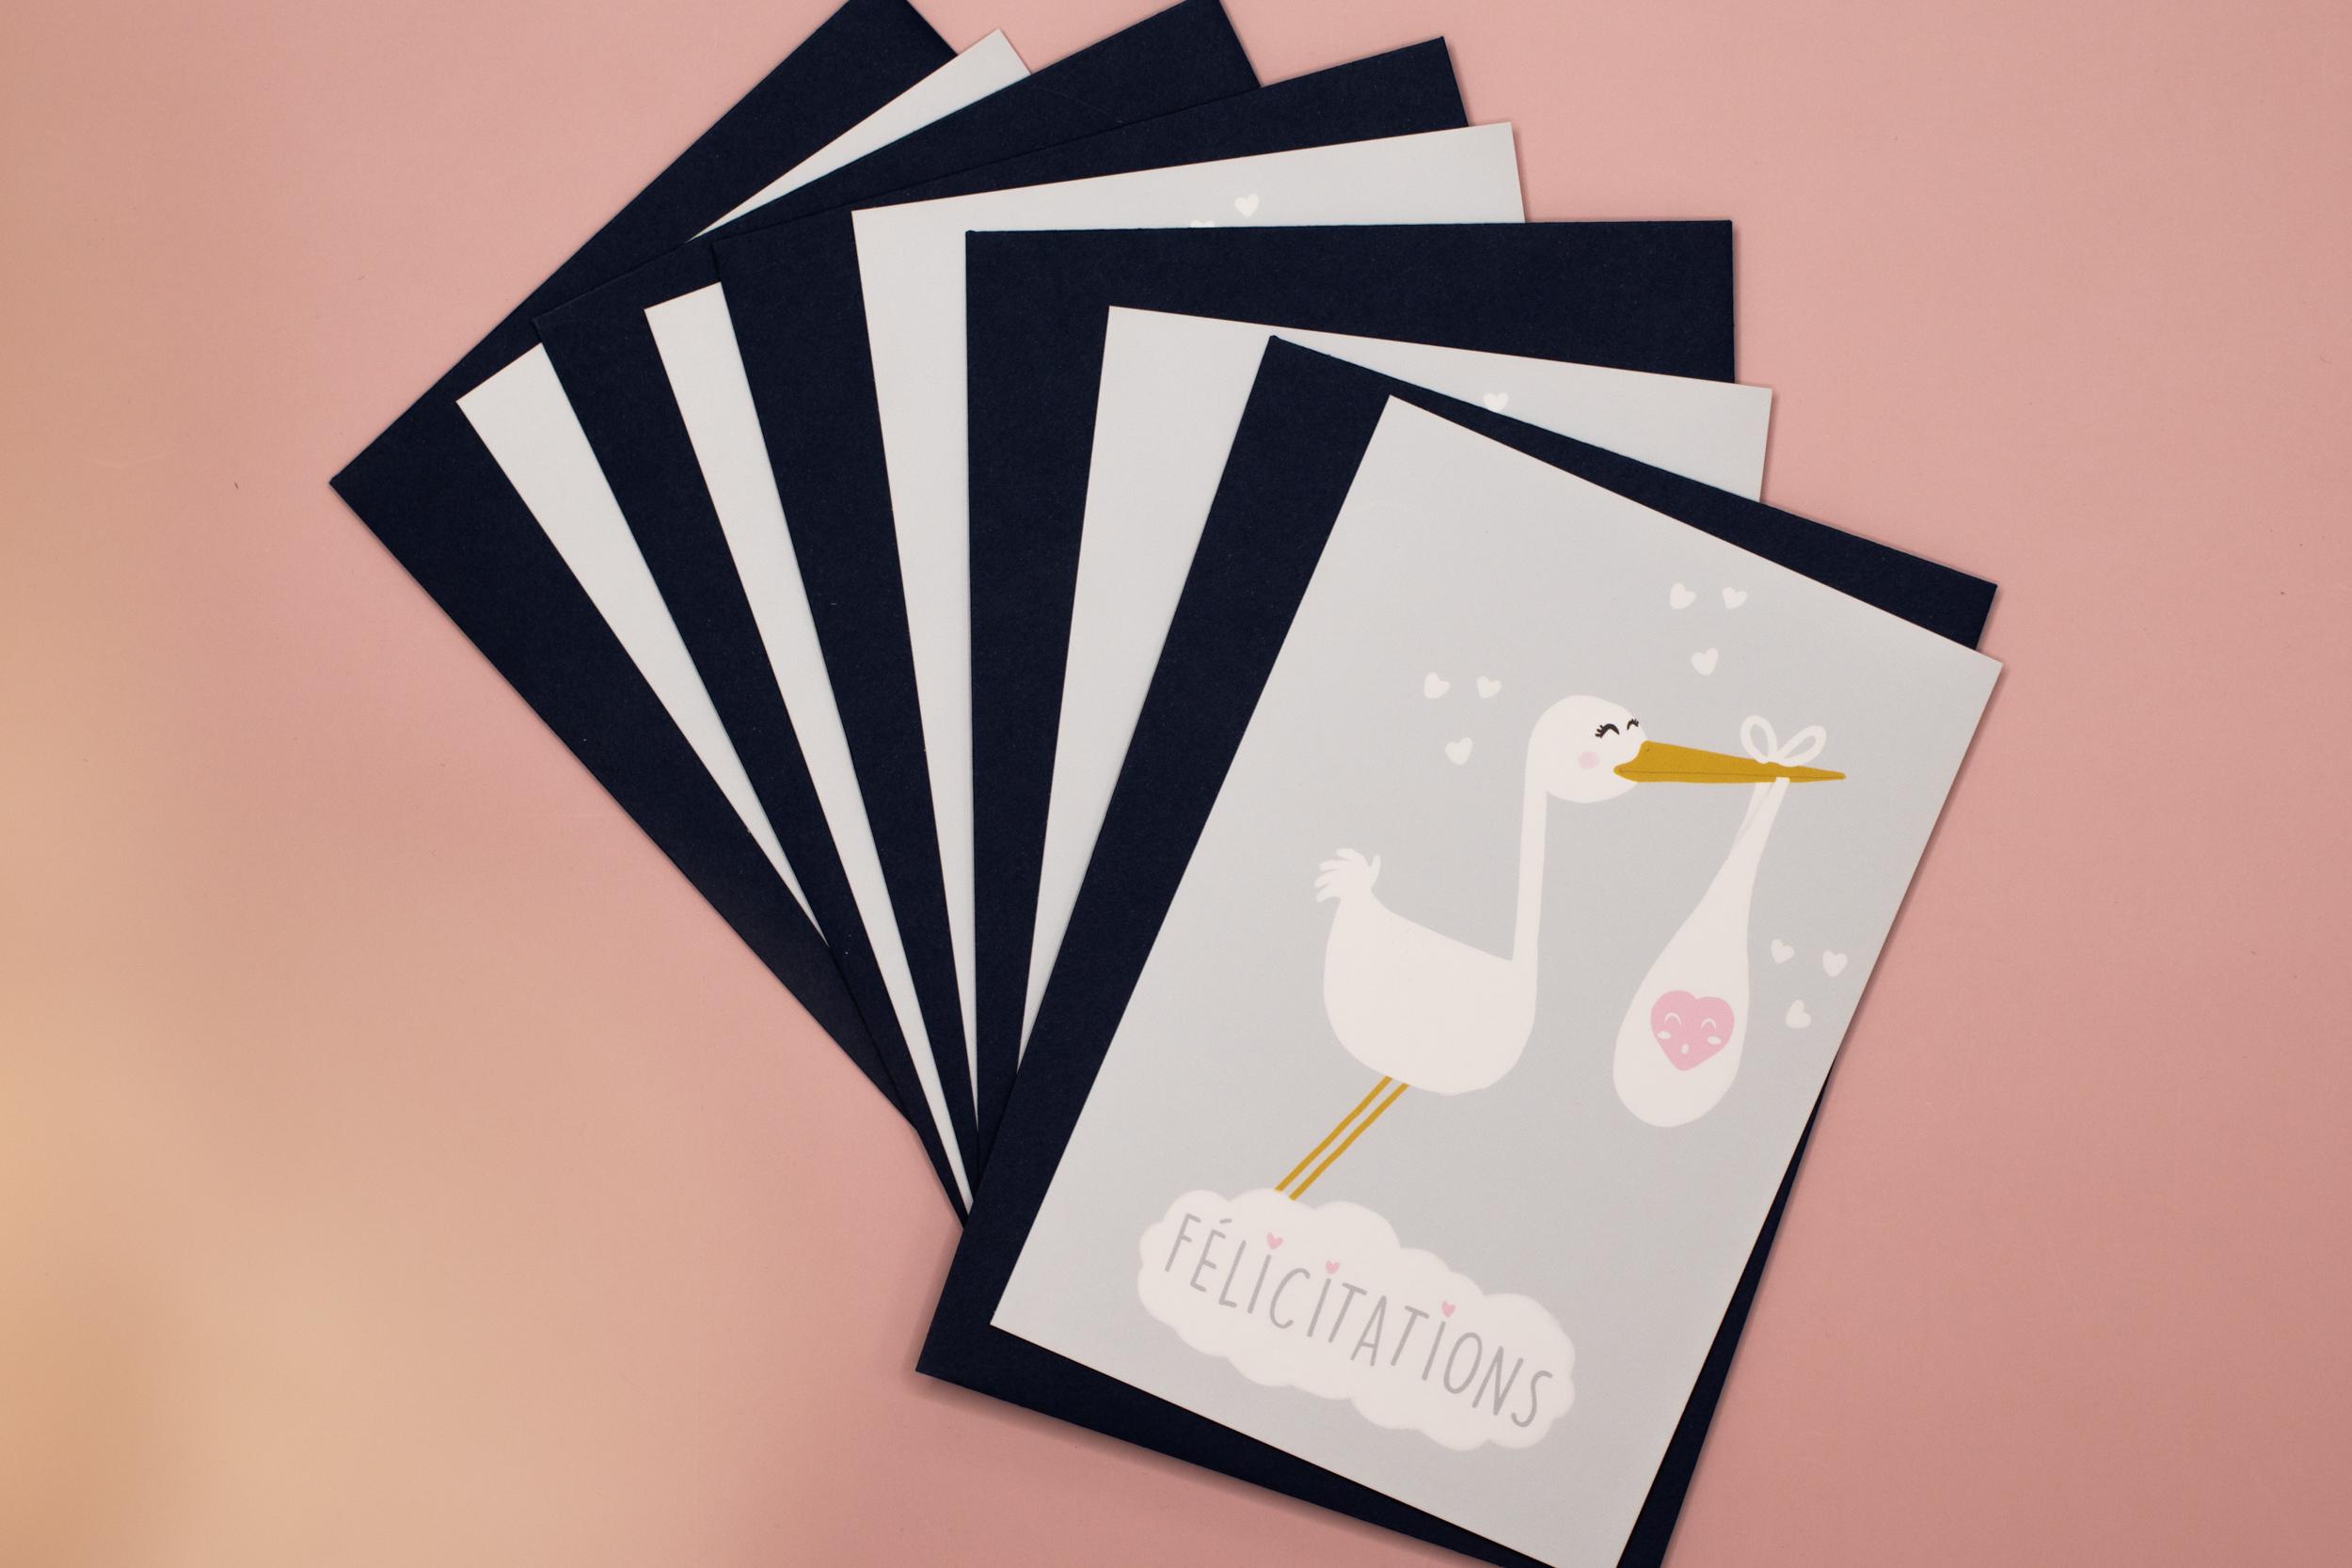 Cartes & enveloppes Félicitation par 5 - Naissance | Cigogne